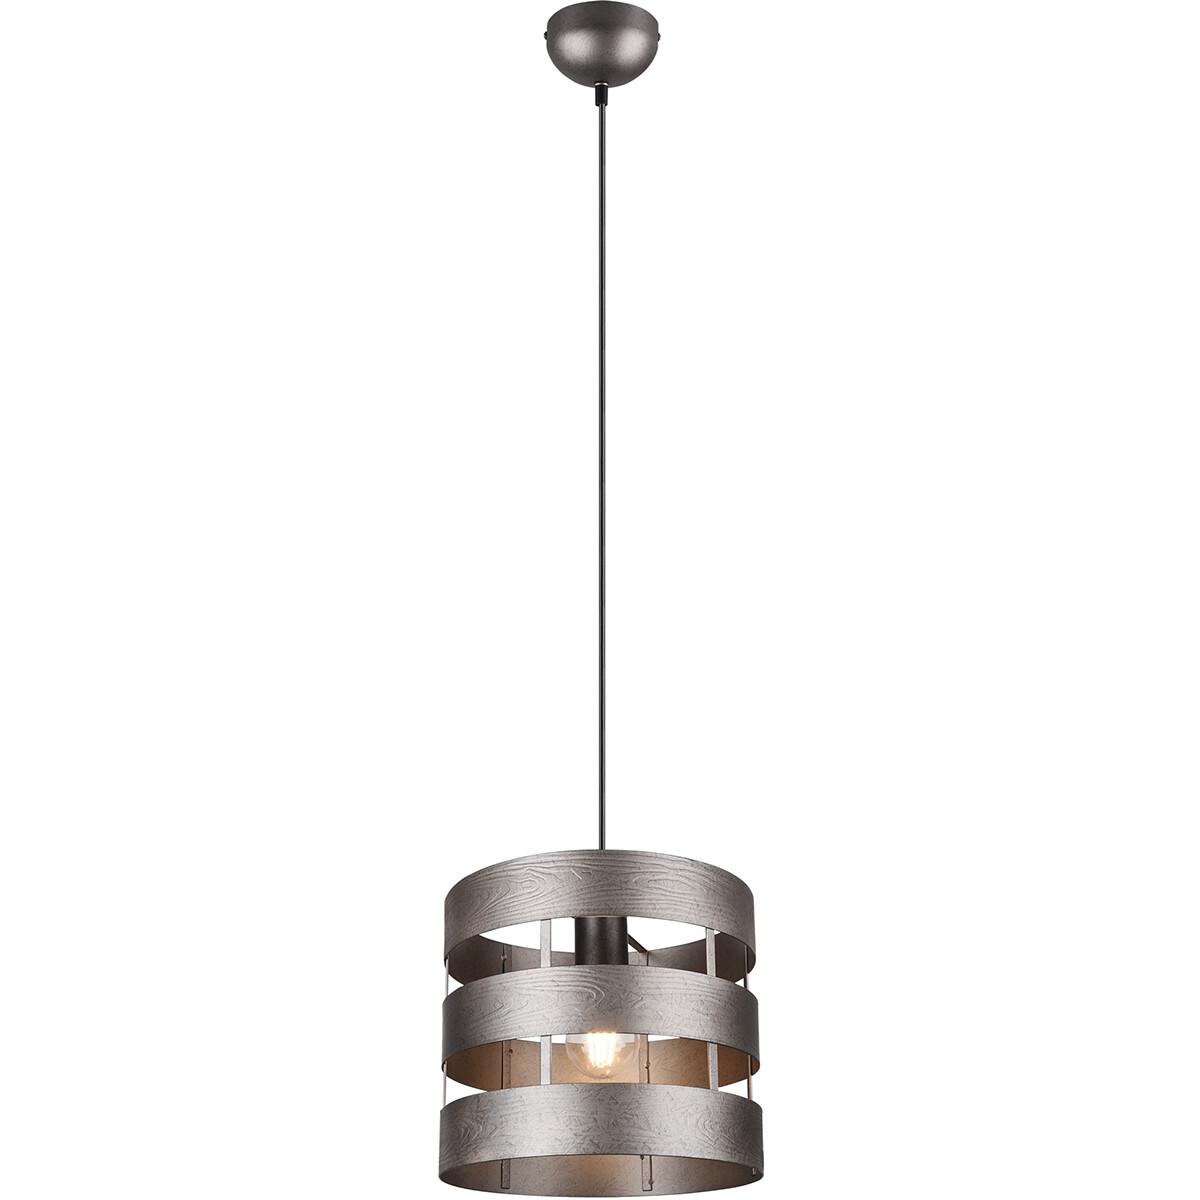 LED Hanglamp - Trion Doncan - E27 Fitting - 1-lichts - Rond - Mat Nikkel - Aluminium